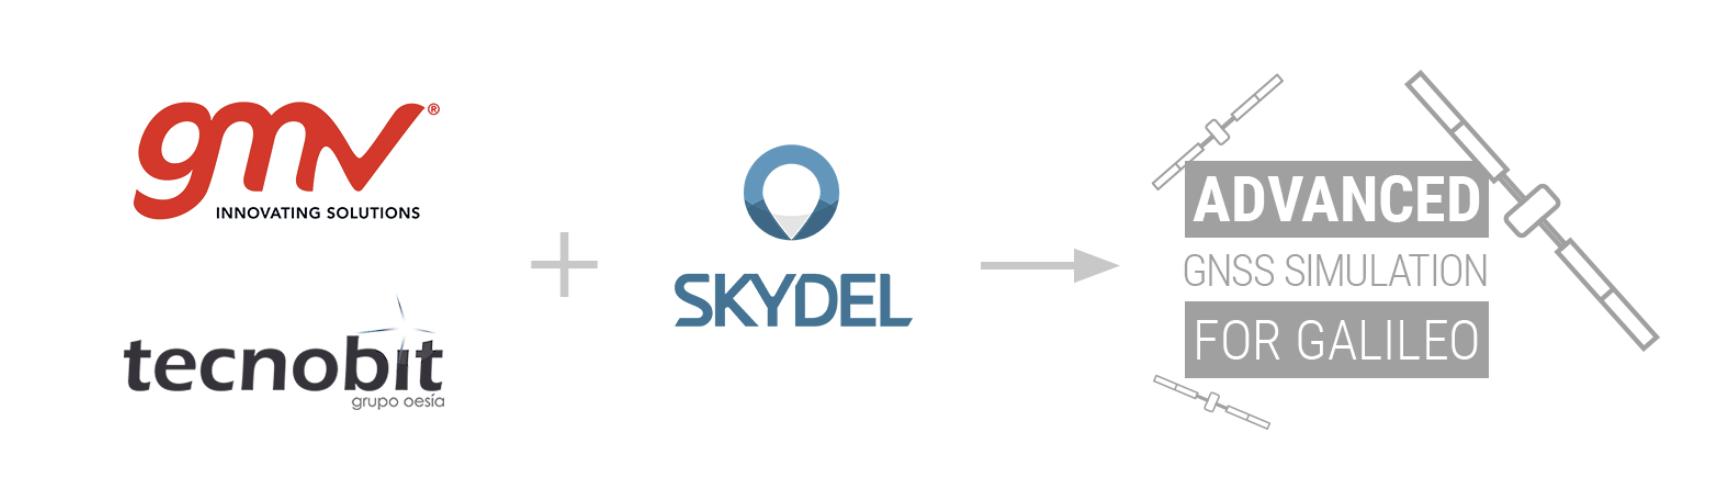 GMV_Tecnobit_Skydel_SDX_simulator